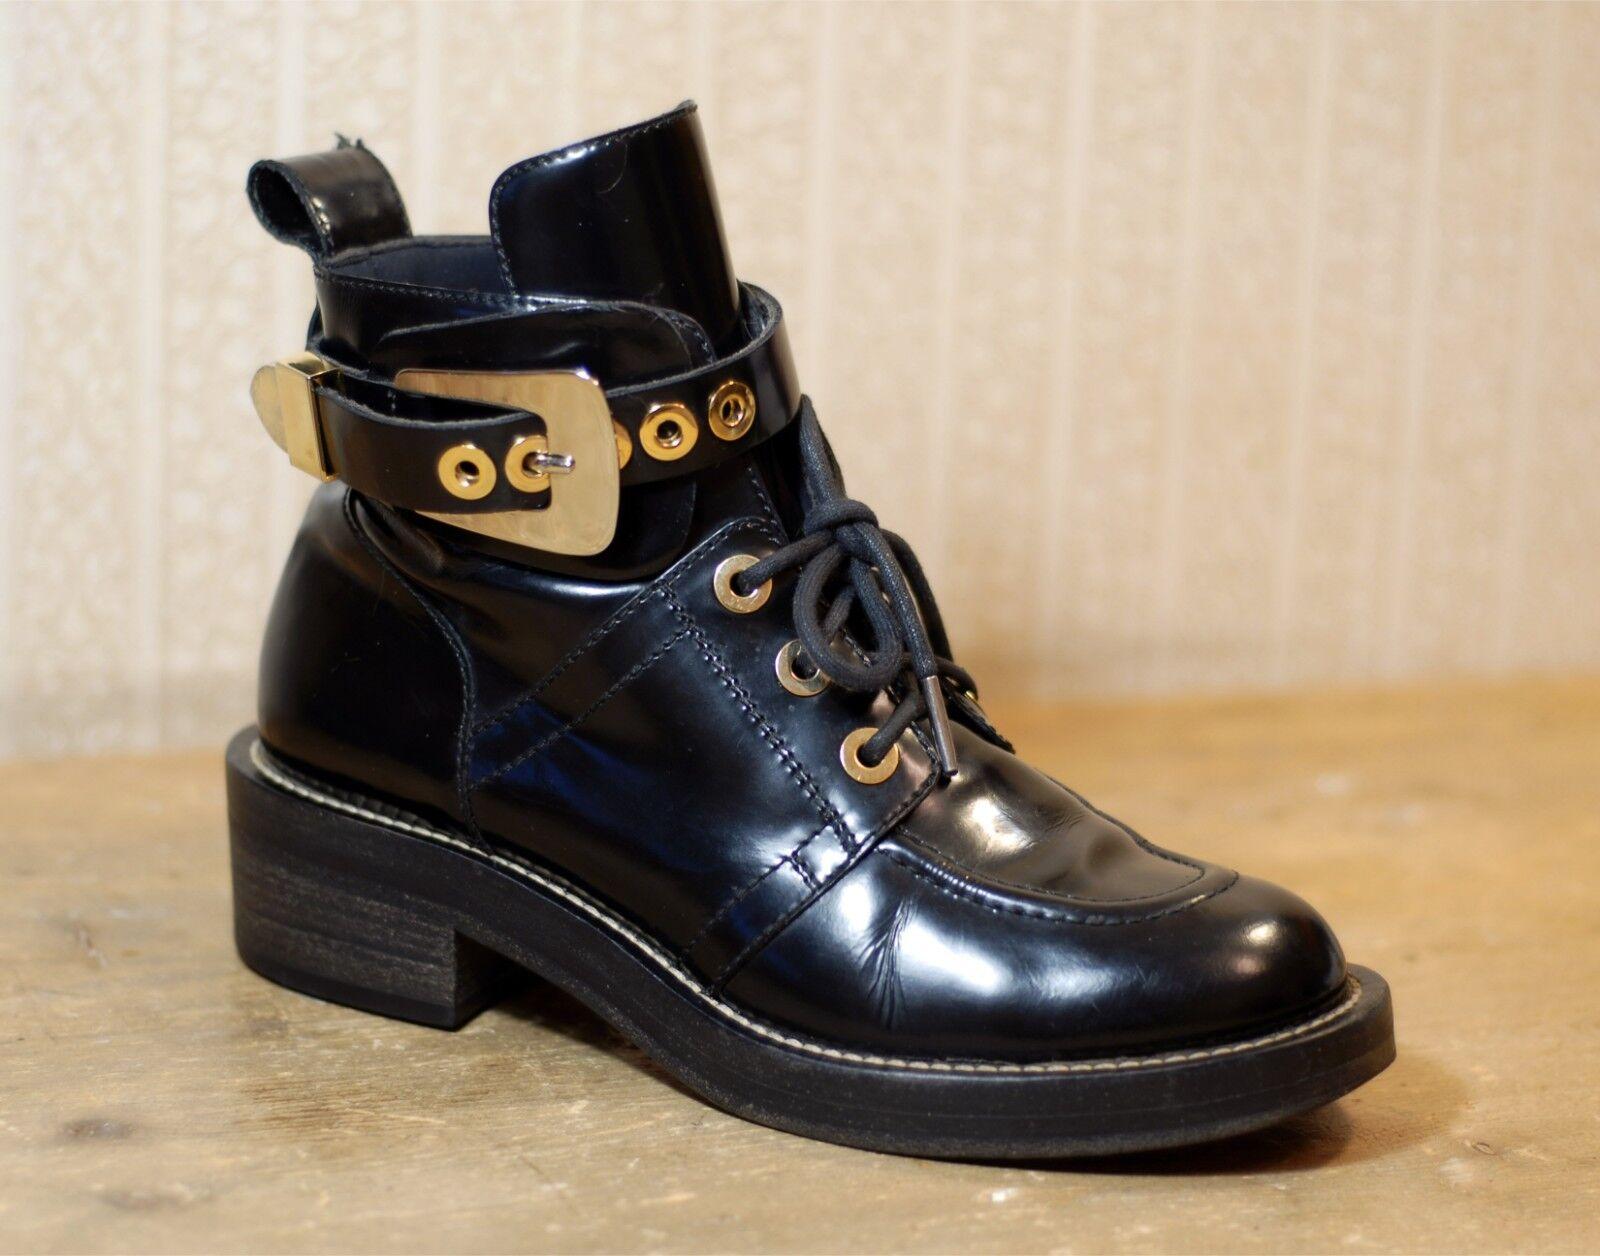 1500  BALENCIAGA Ceinture black gold laceup NO cut out boots 38-38.5 5-5.5 7-7.5